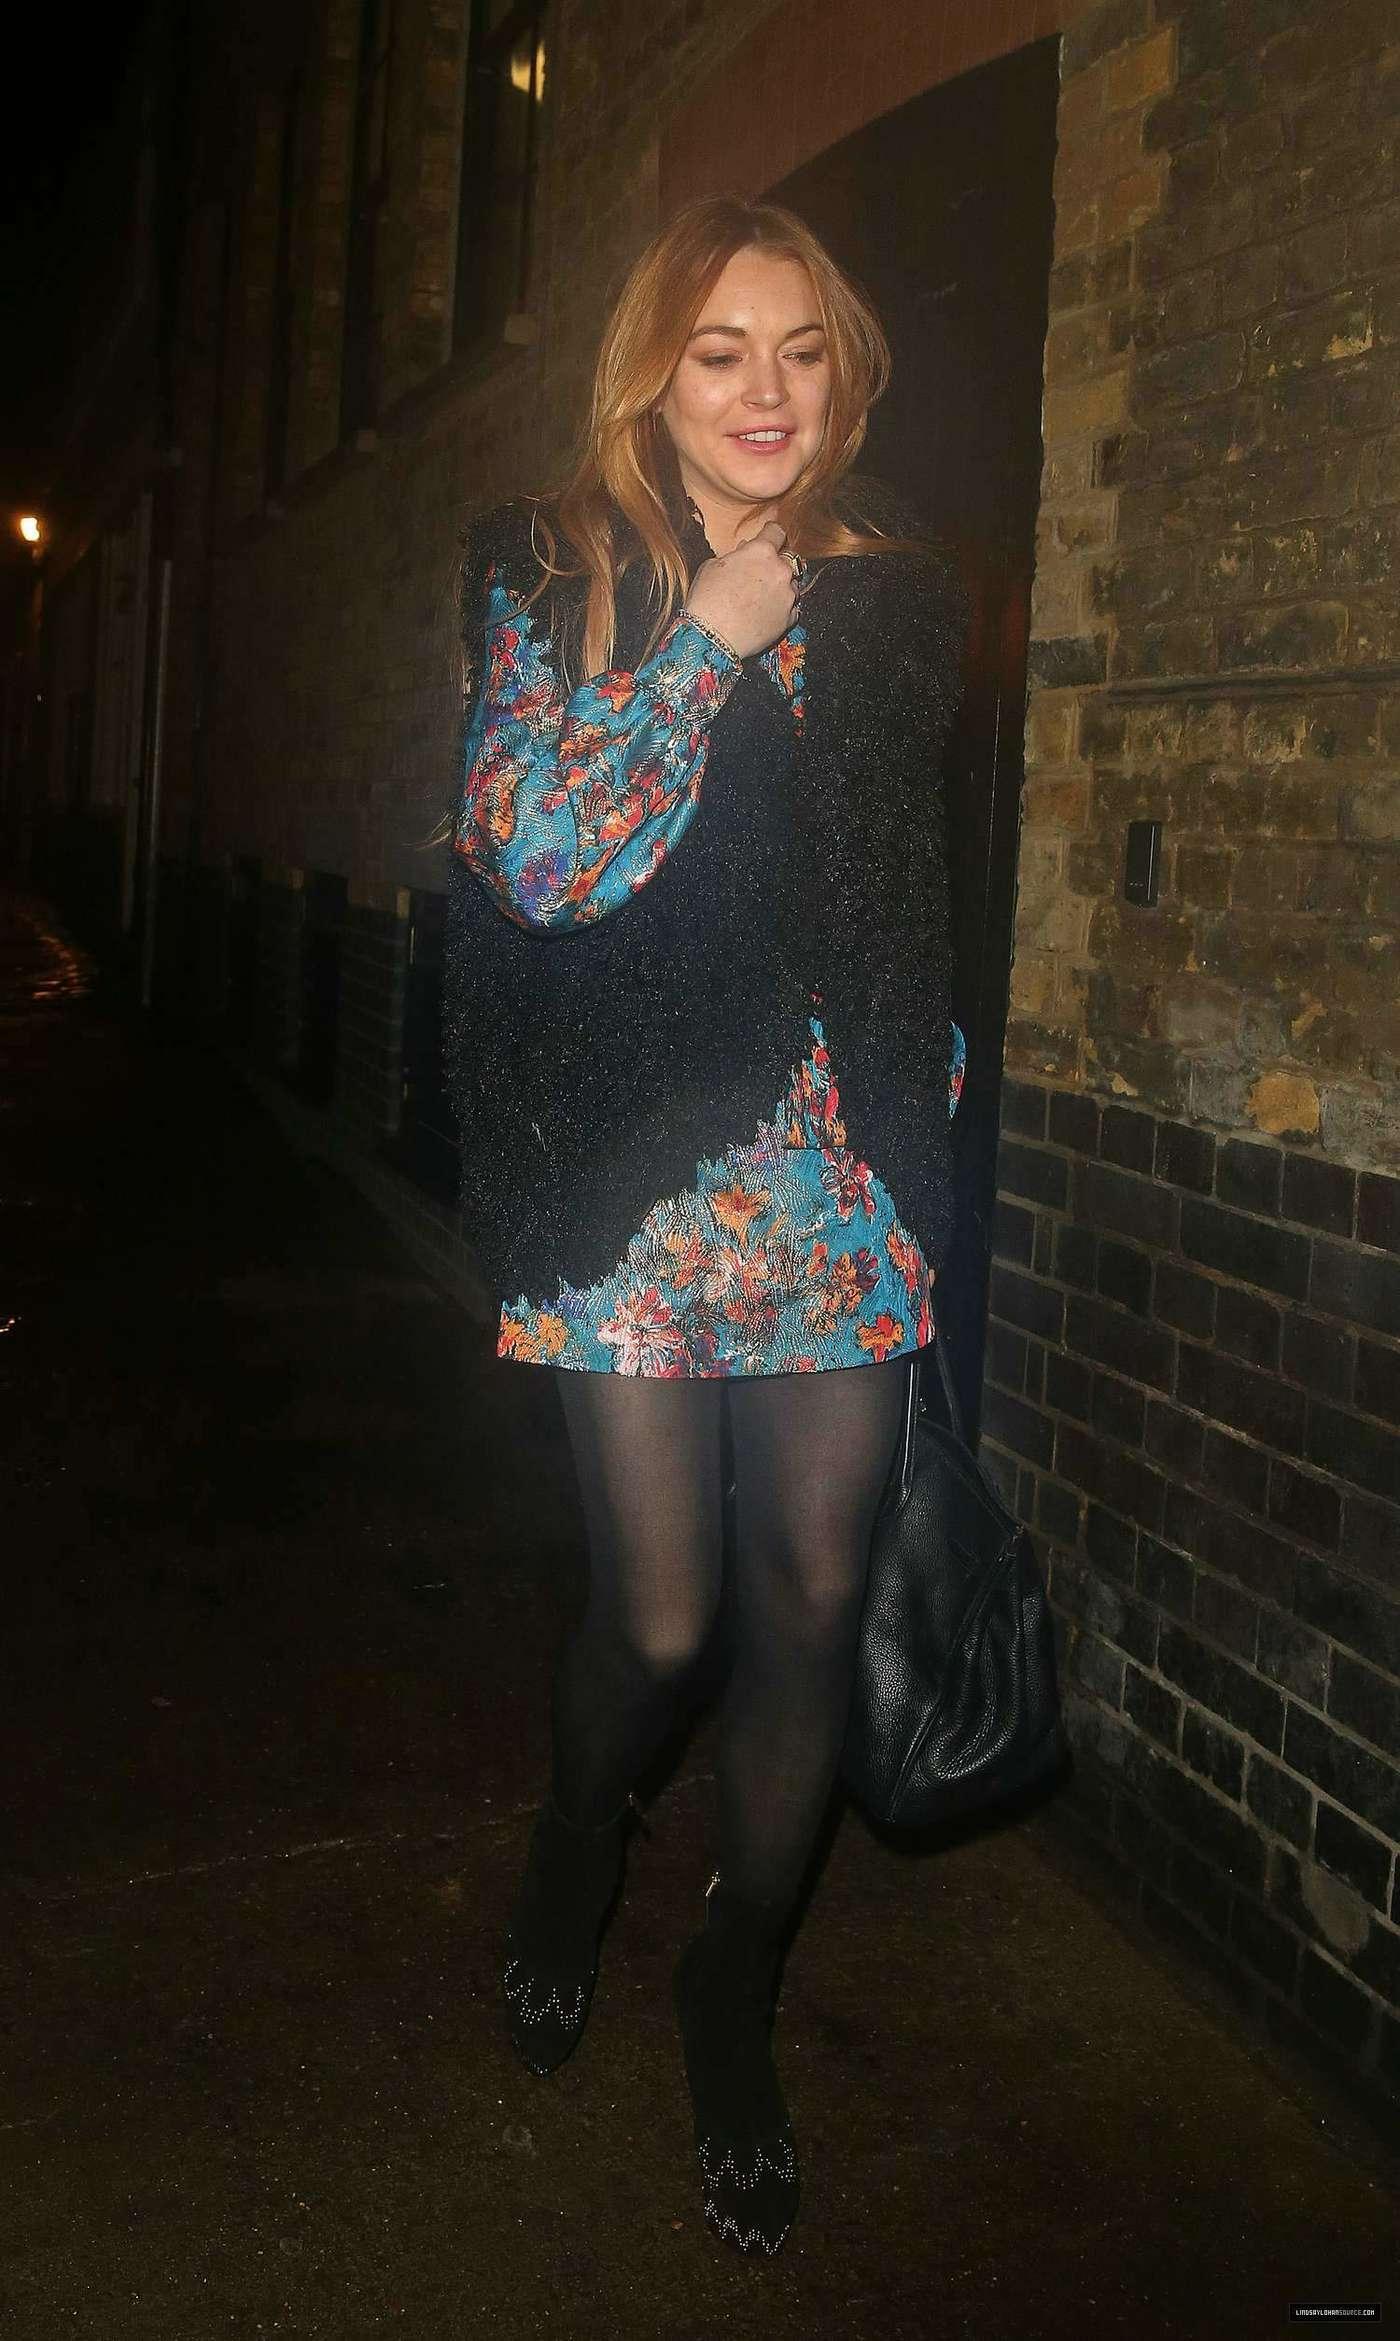 Lindsay Lohan 2014 : Lindsay Lohan in Mini Dress Leaves the Chiltern Firehouse -17